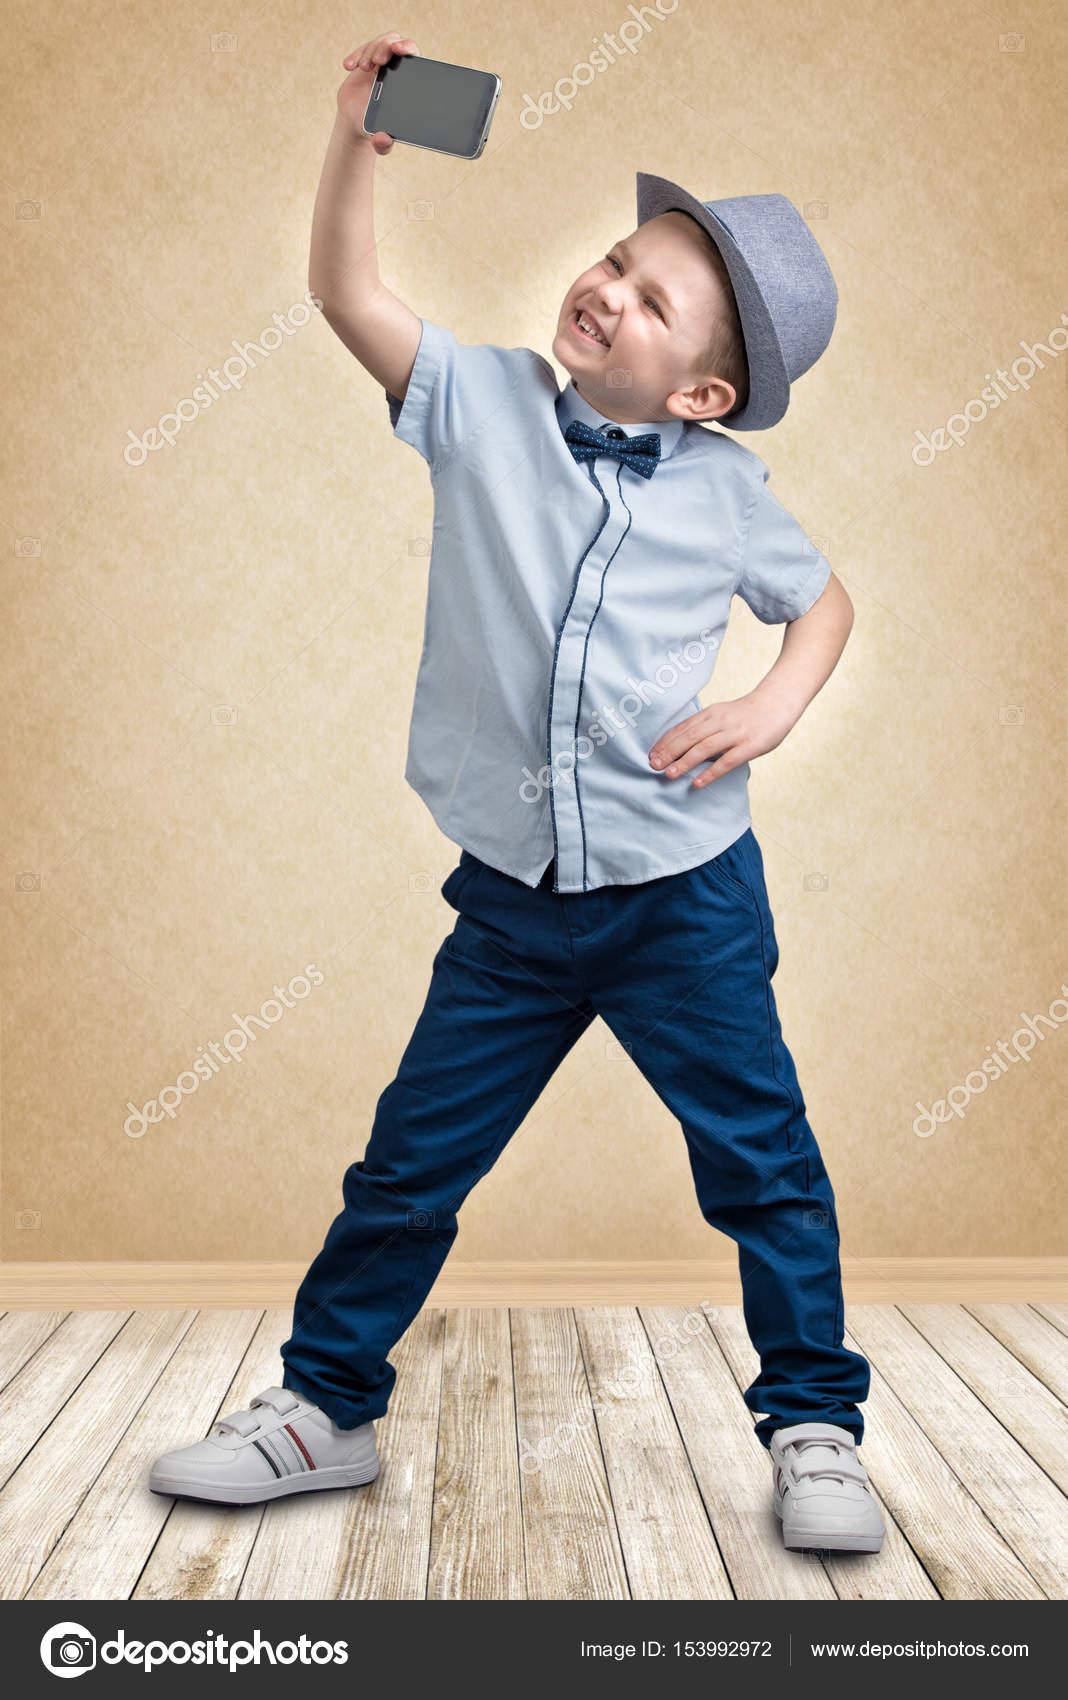 f9387b3edc8 Παιδική Μόδα — · Κομψό αγόρι σε ένα καπέλο λήψης selfie στο κινητό τηλέφωνο  — Εικόνα από ...